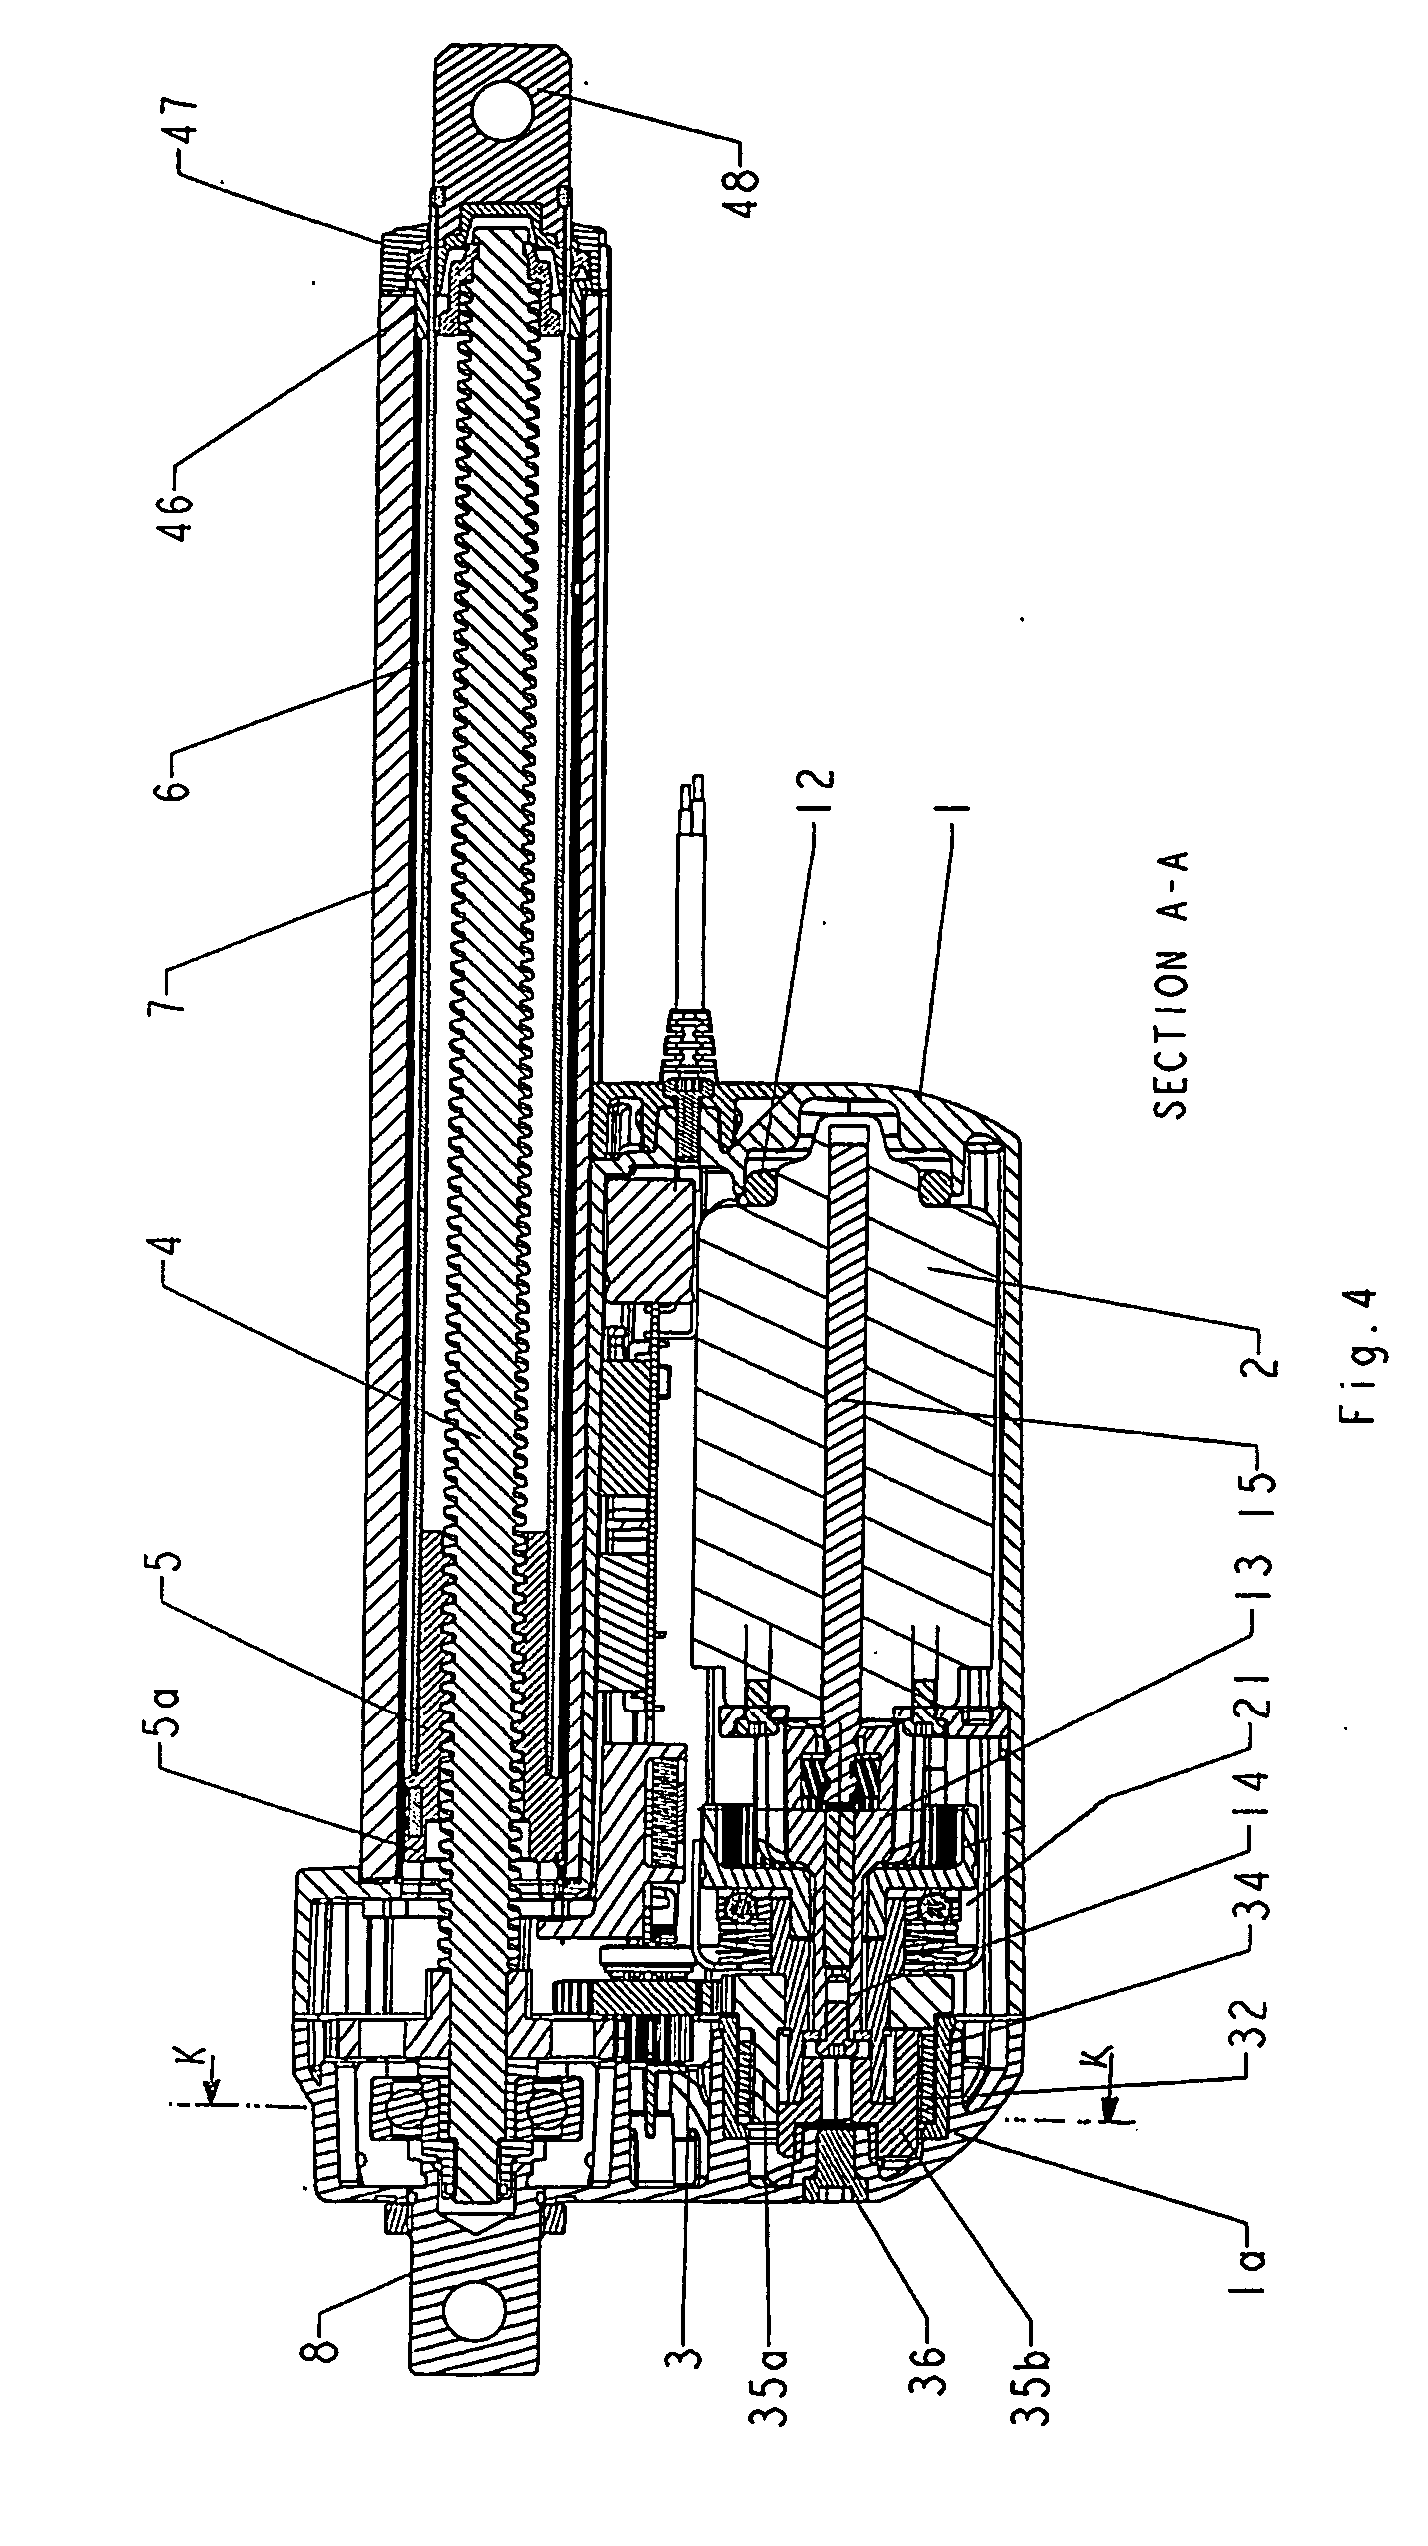 12 Volt Linear Electric Actuator